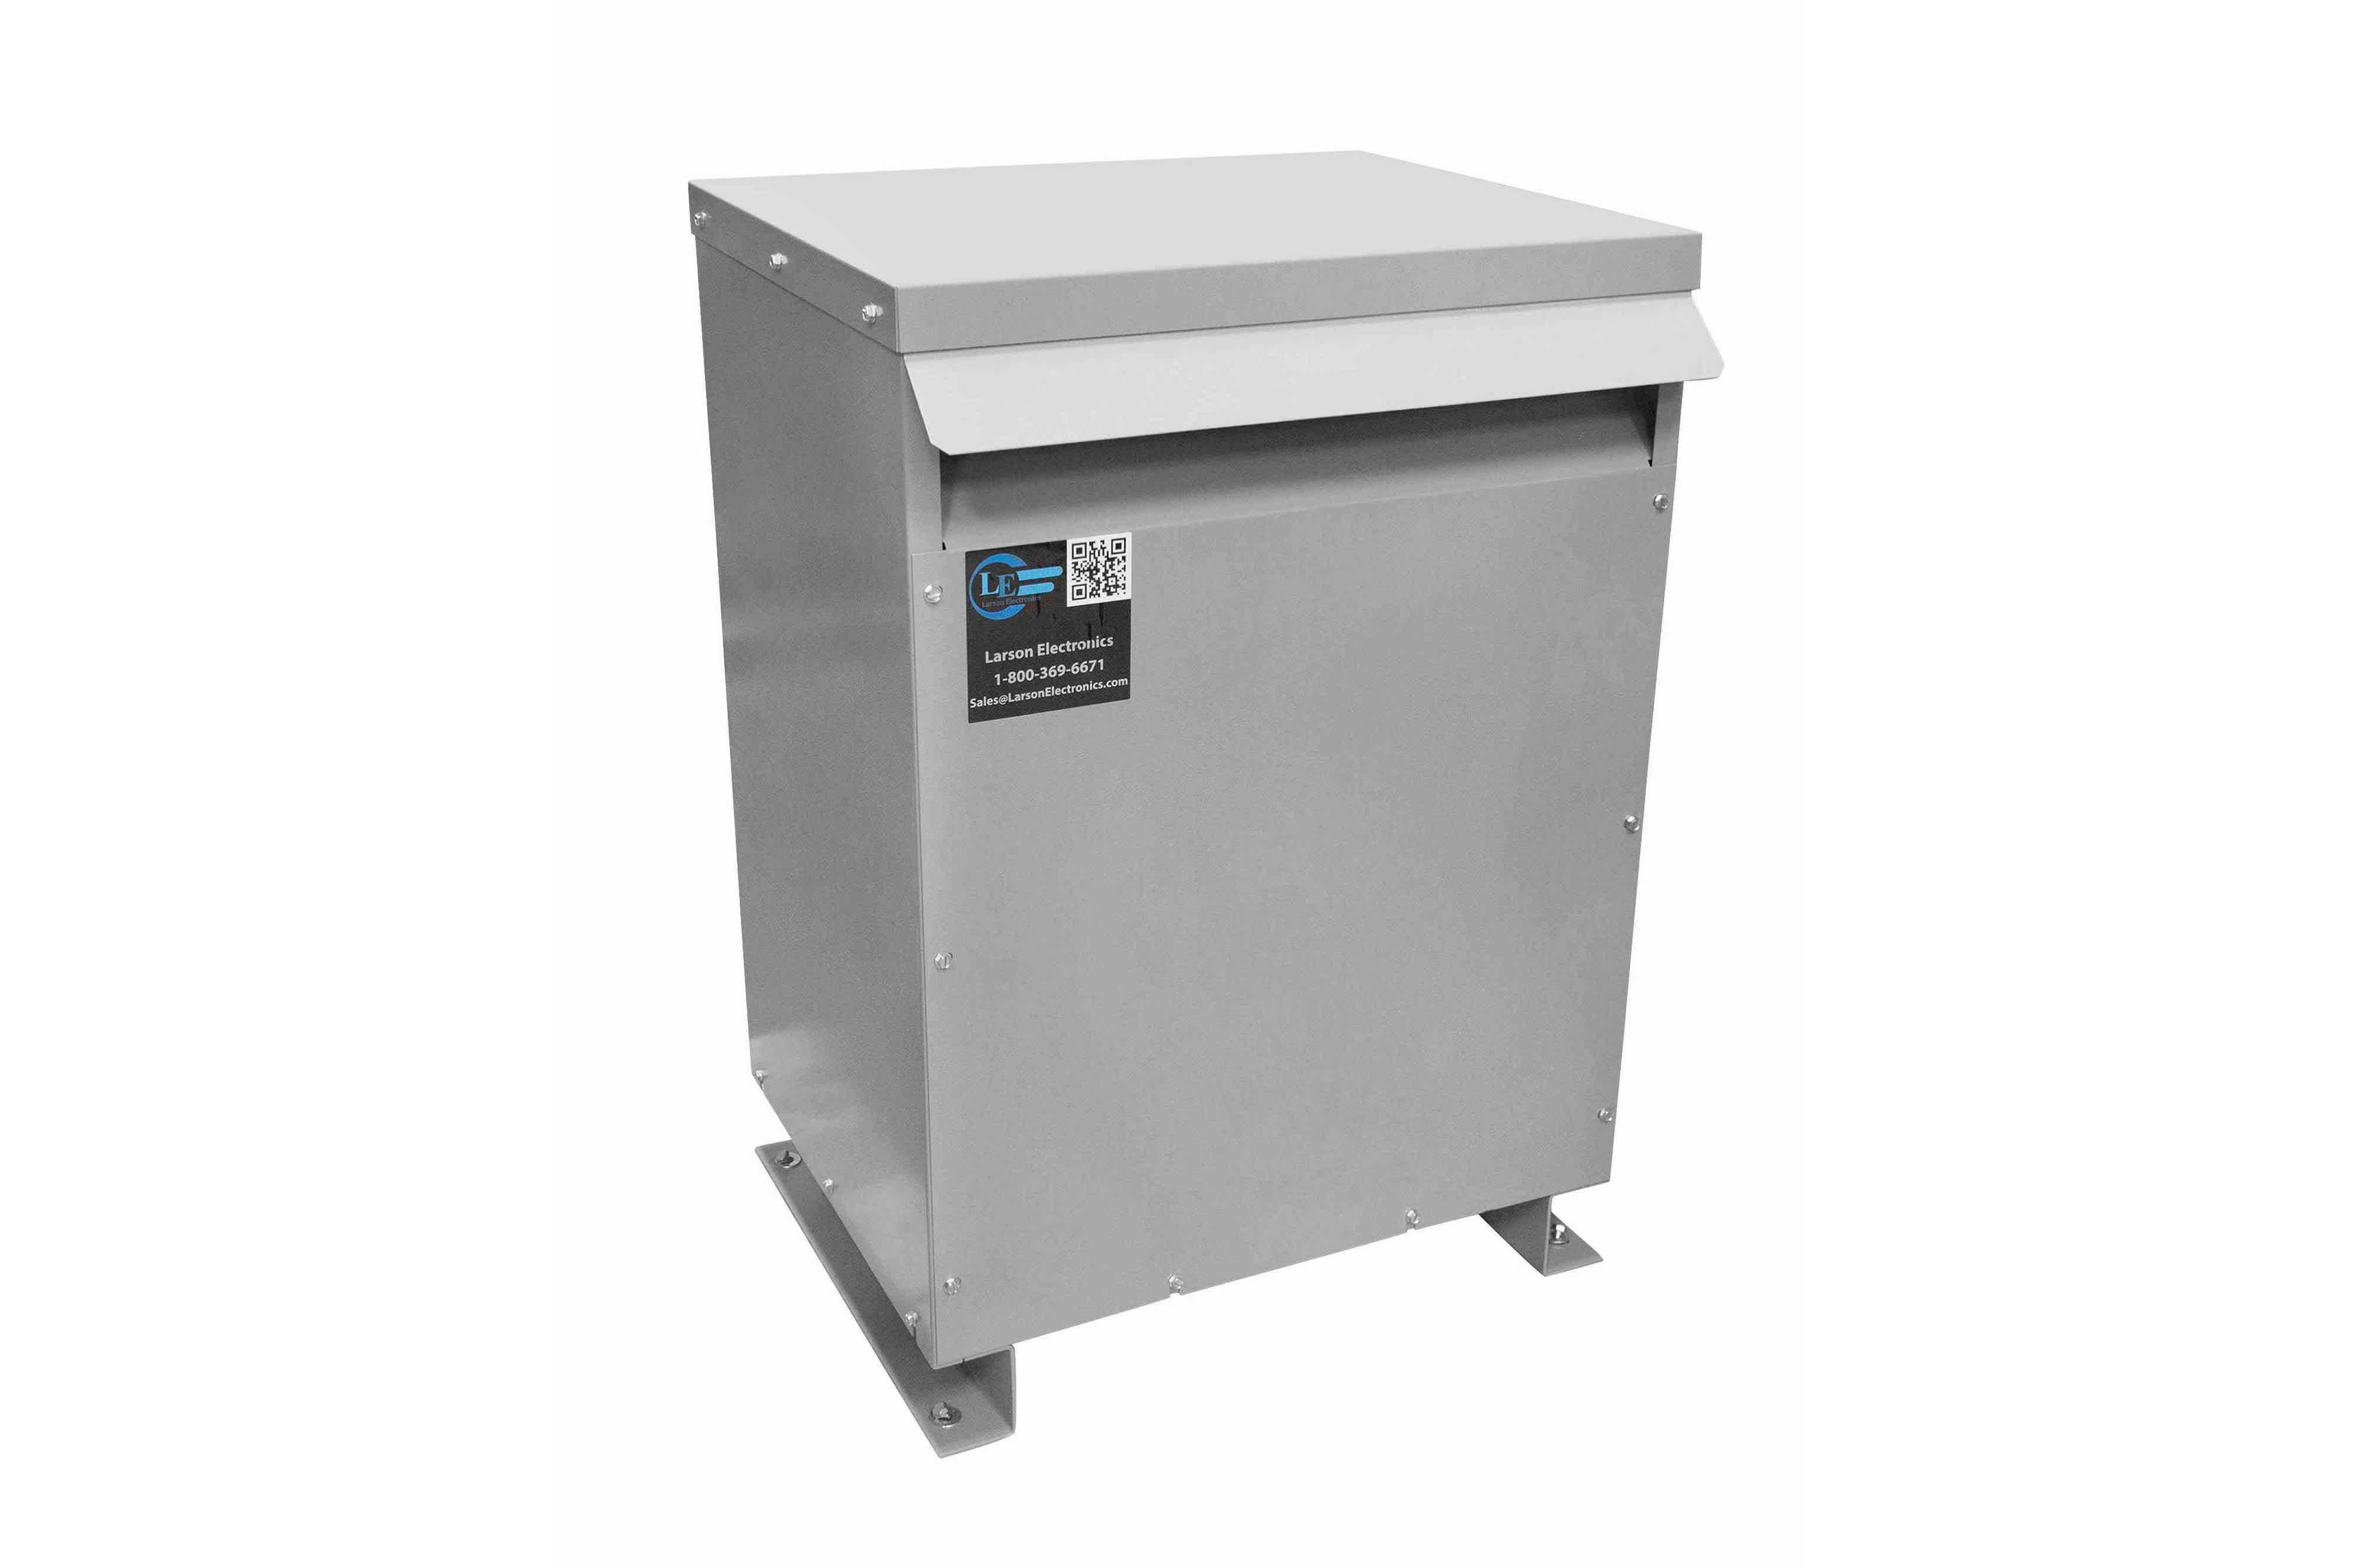 15 kVA 3PH Isolation Transformer, 600V Wye Primary, 415V Delta Secondary, N3R, Ventilated, 60 Hz